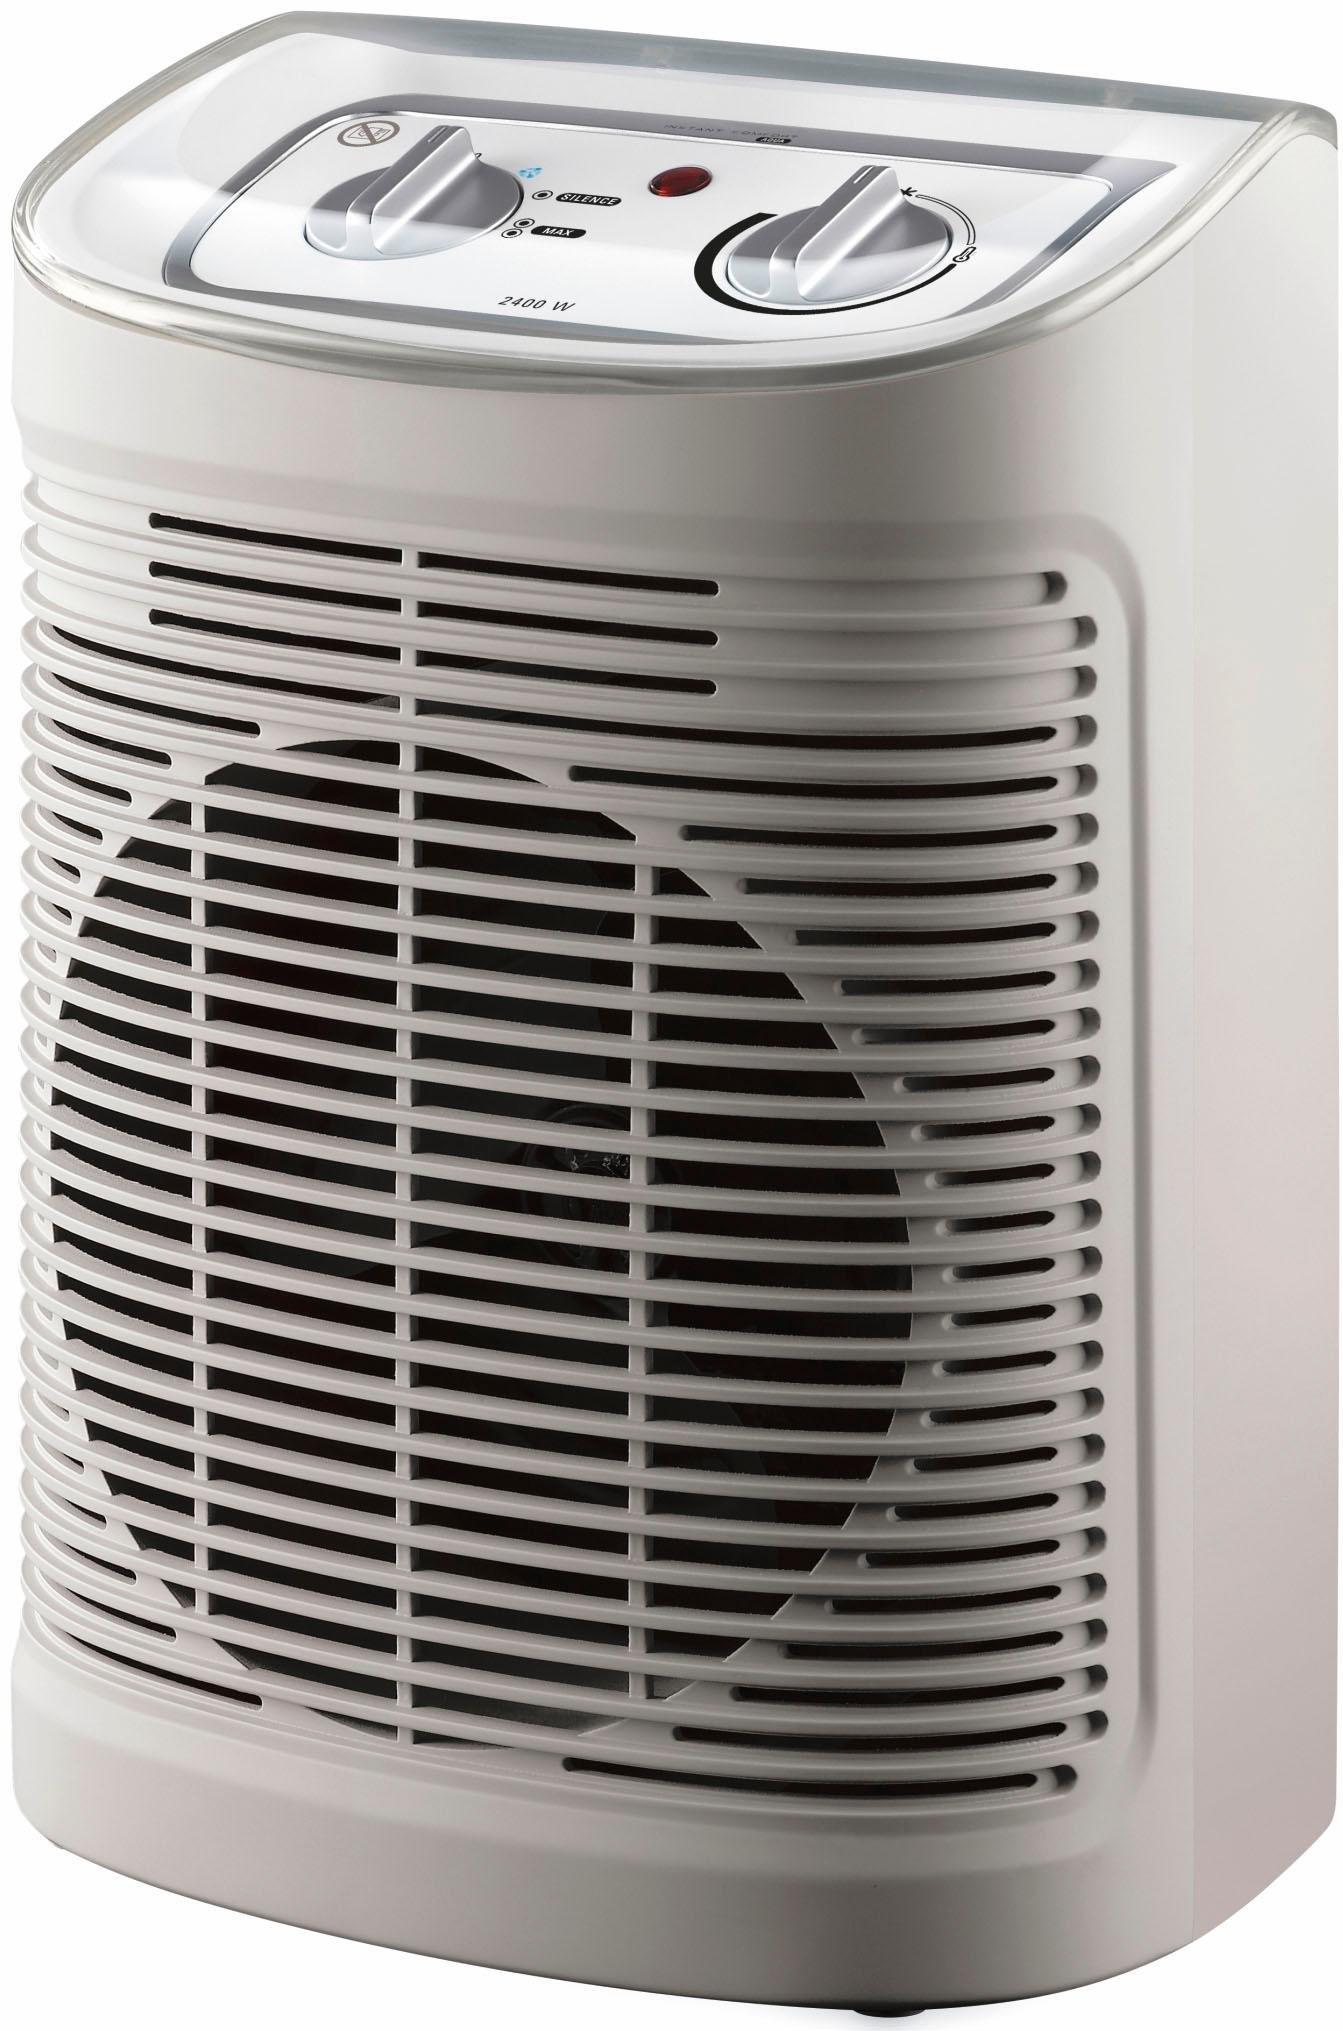 rowenta ventilatorkachel so6510 instant comfort aqua online shoppen otto. Black Bedroom Furniture Sets. Home Design Ideas